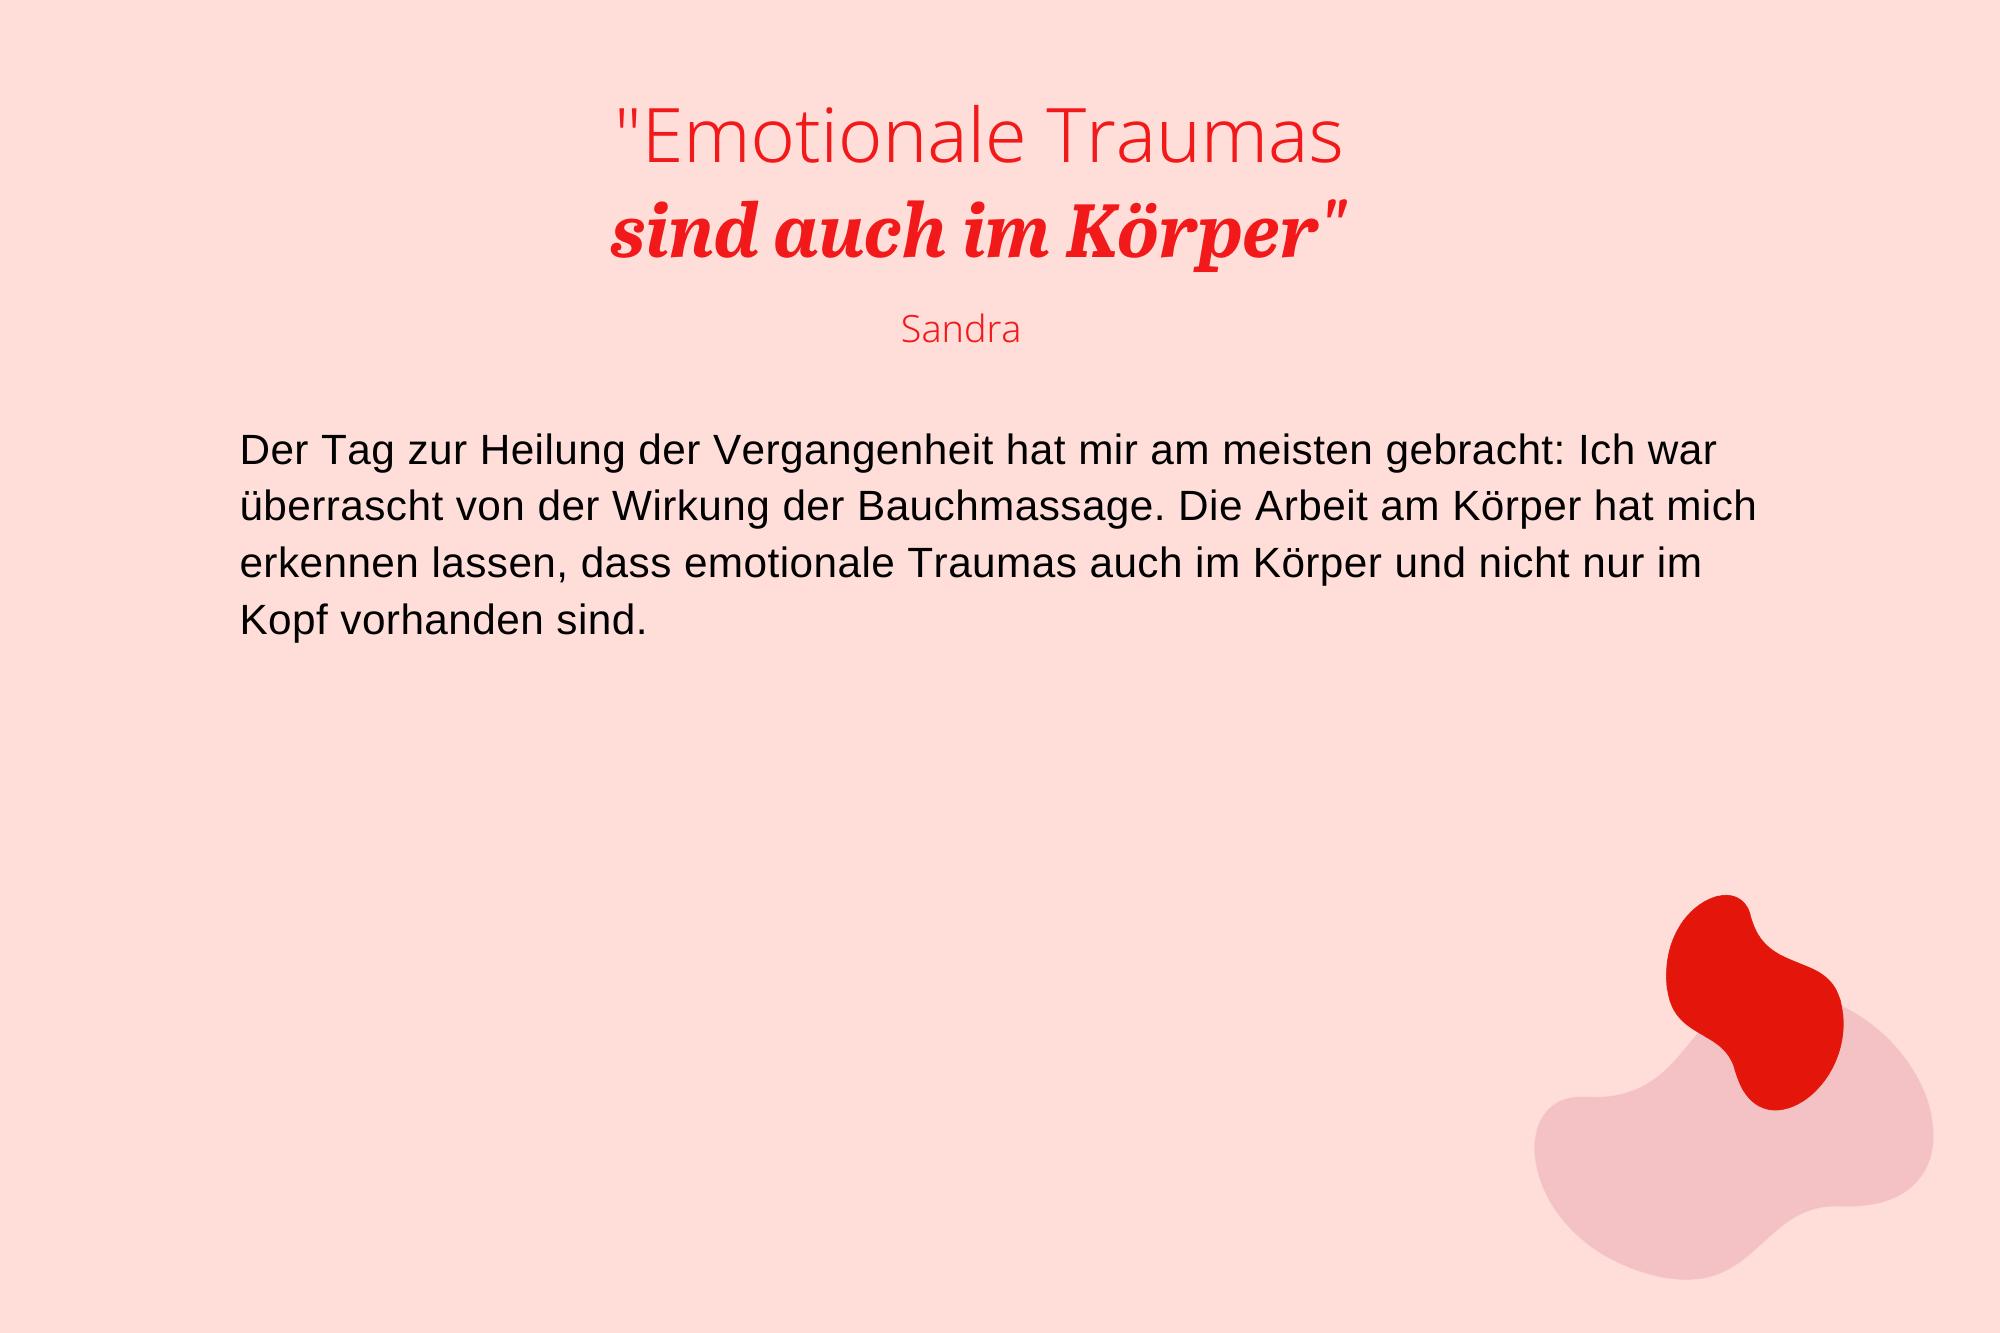 DE_Erfahrungsberichte_Liebescoach_Emotionale Traumas sind auch im Körper